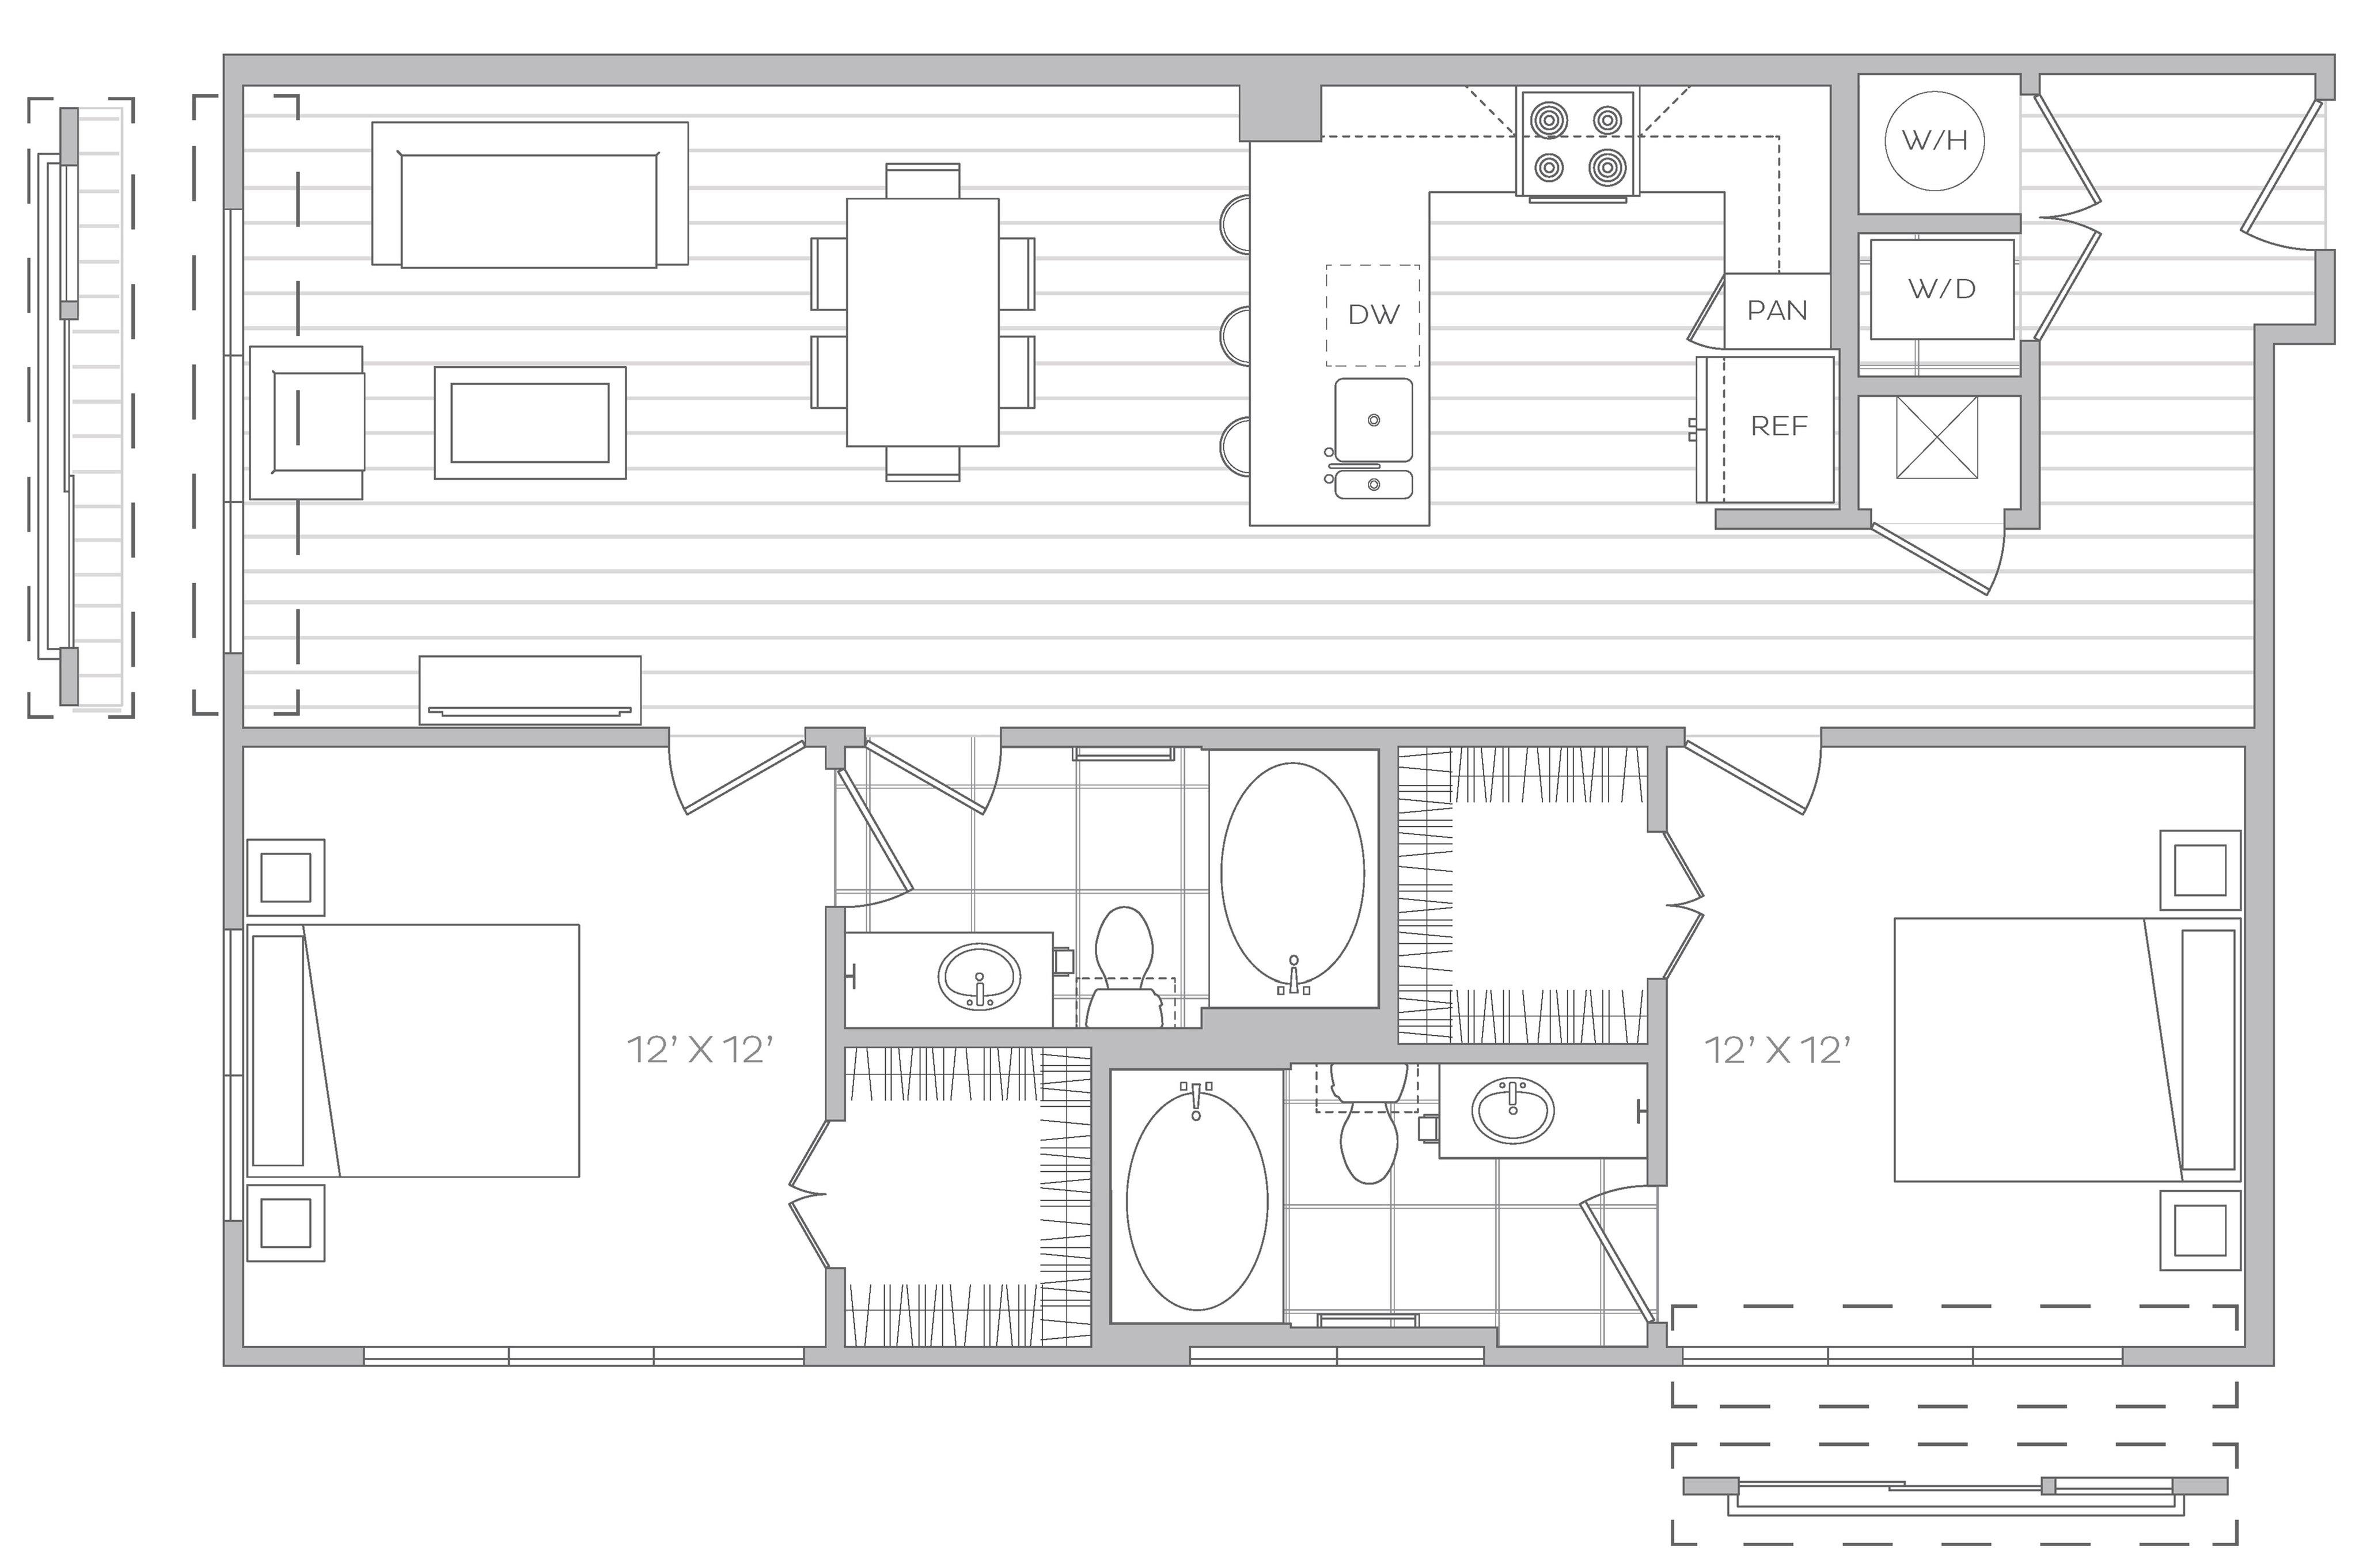 2 Bed / 2 Bath Apartment in DENVER CO | Hanover Platt Park